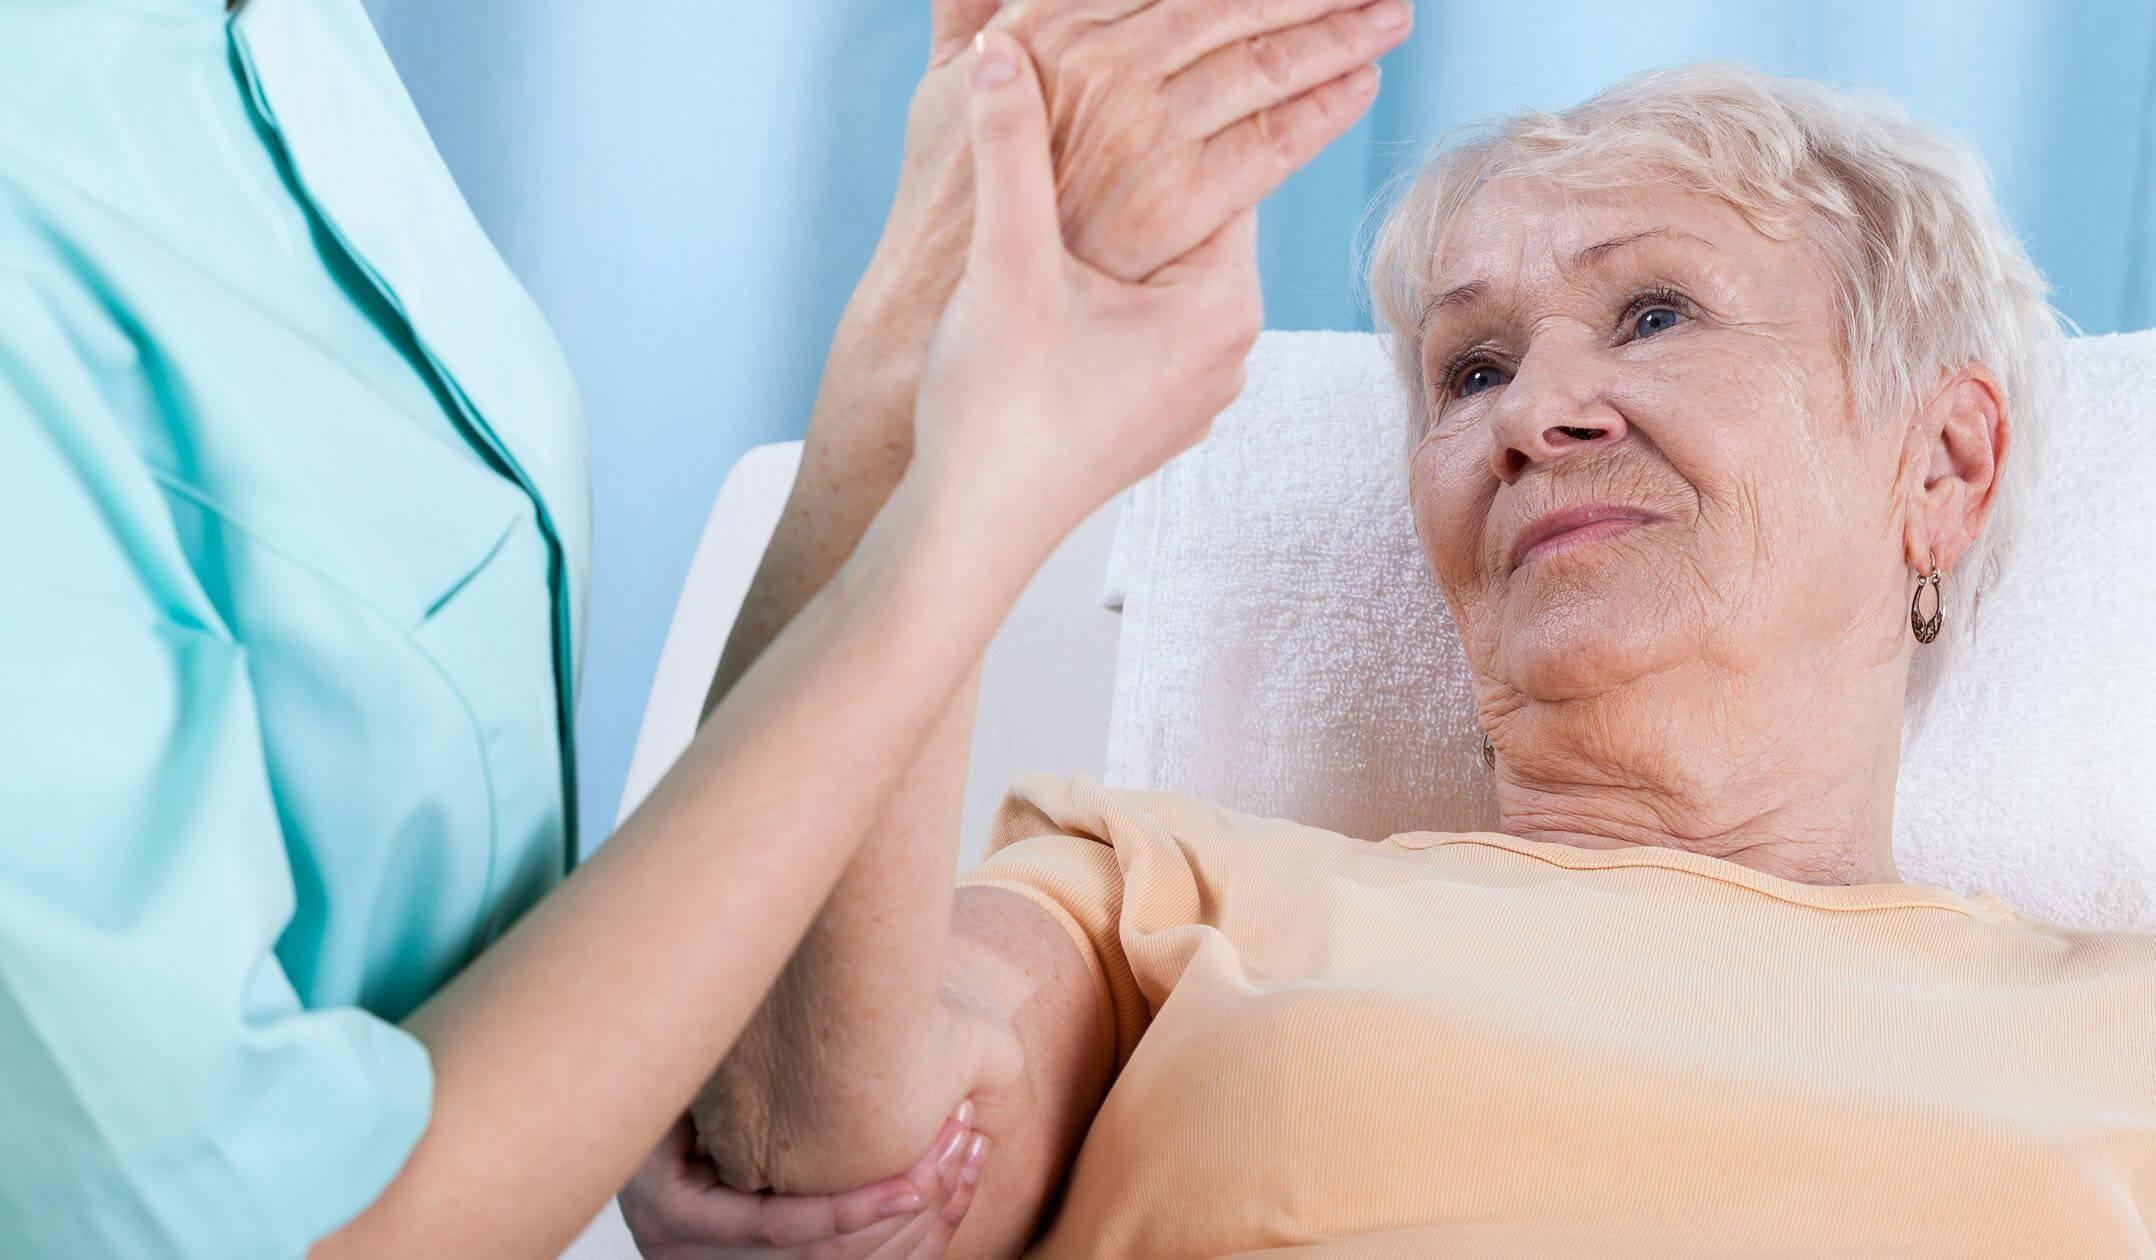 Комплексная профилактика остеопороза